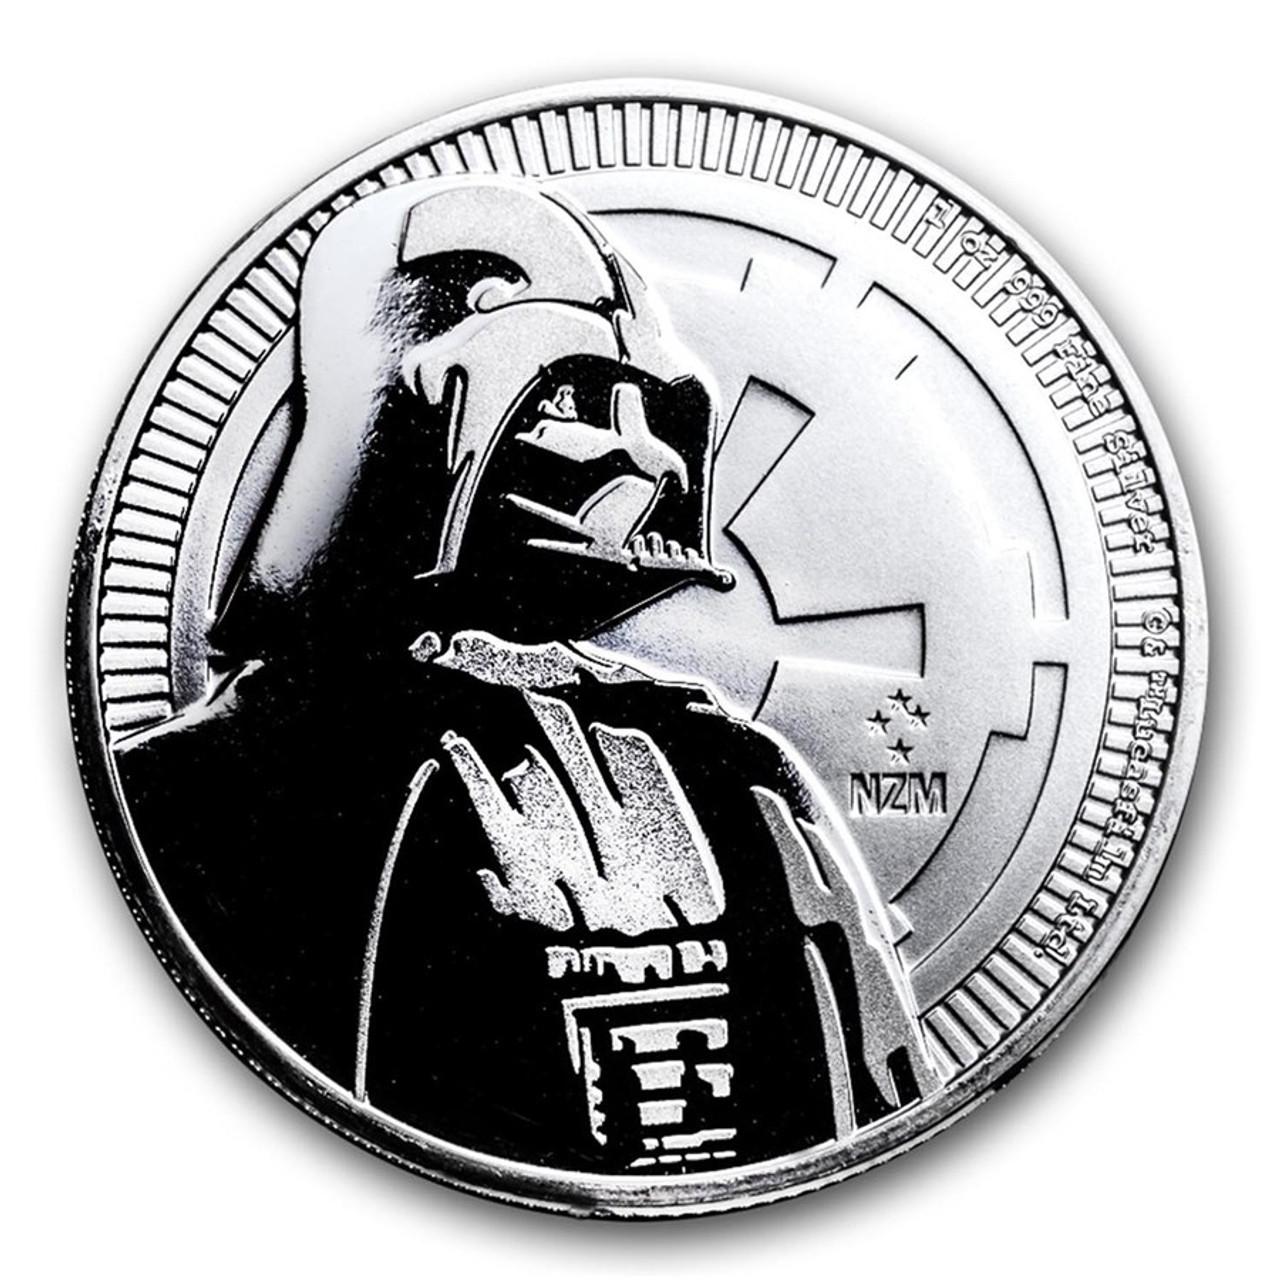 2018 $2 Niue Silver Darth Vader Star Wars .999 1 oz Brilliant Uncirculated